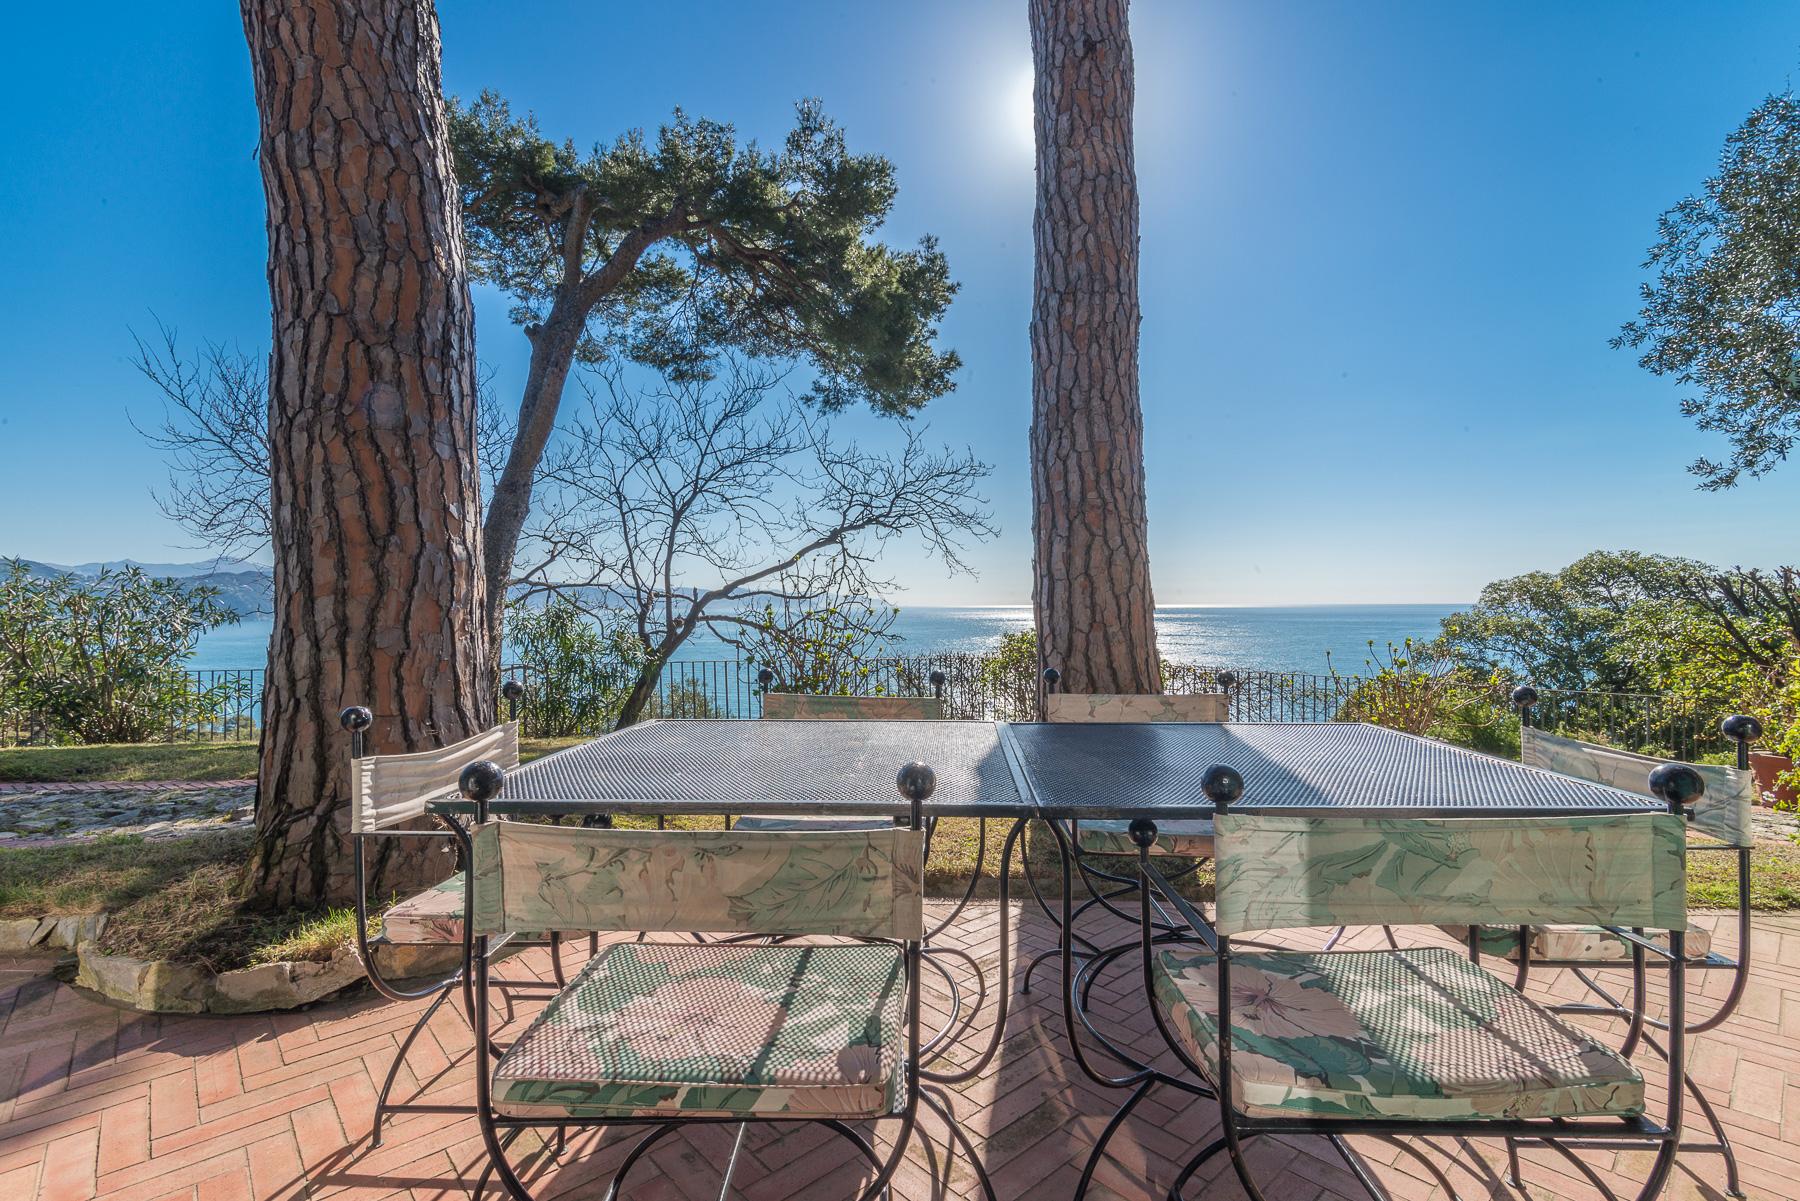 Villa in Vendita a Santa Margherita Ligure: 5 locali, 440 mq - Foto 8